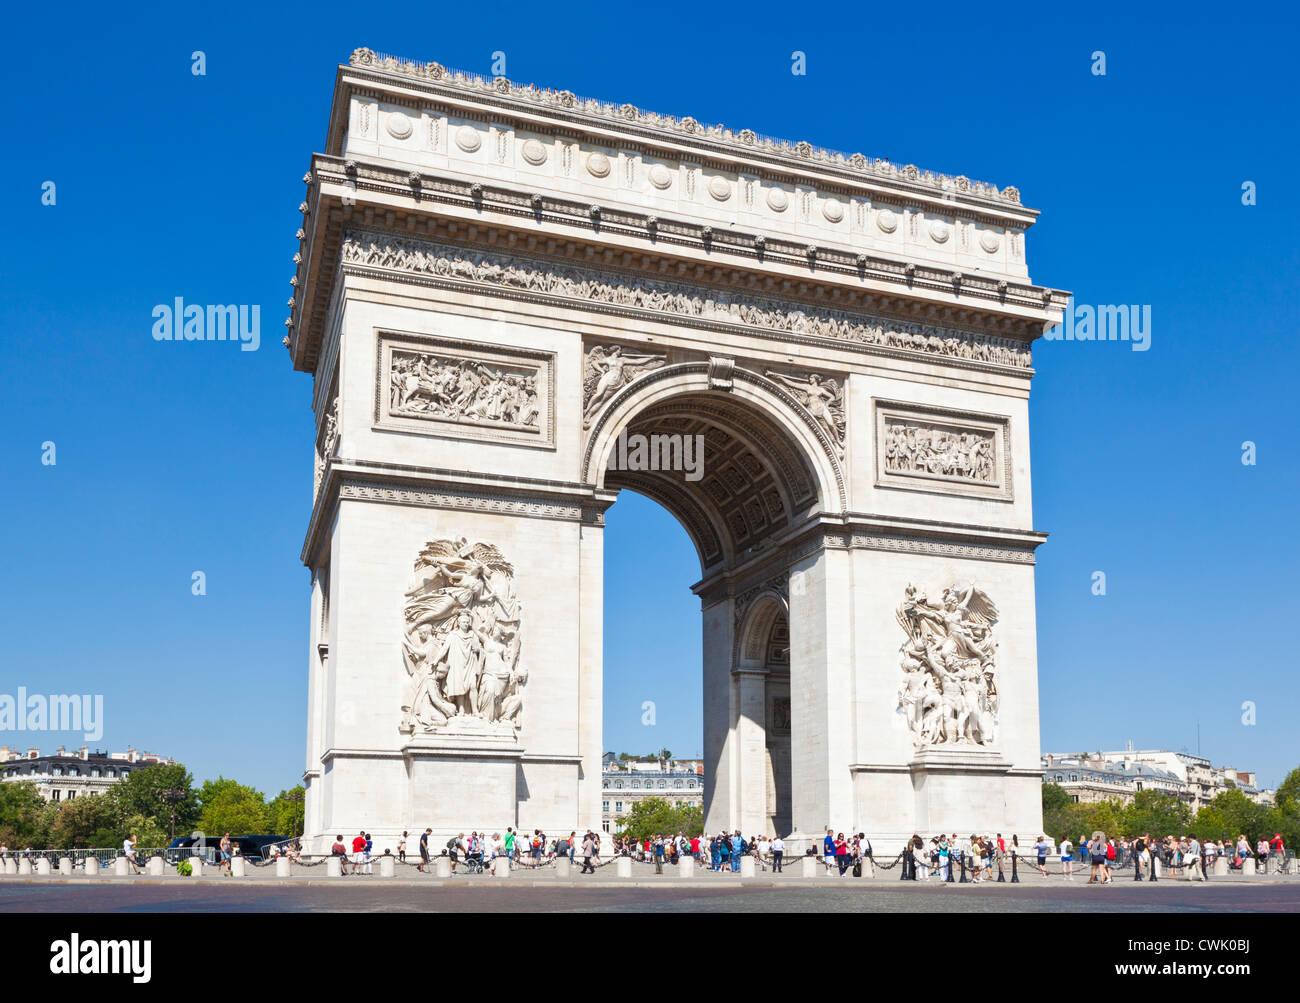 Napoleons Arc de Triomphe and the Champs Elysees Paris France EU Europe - Stock Image